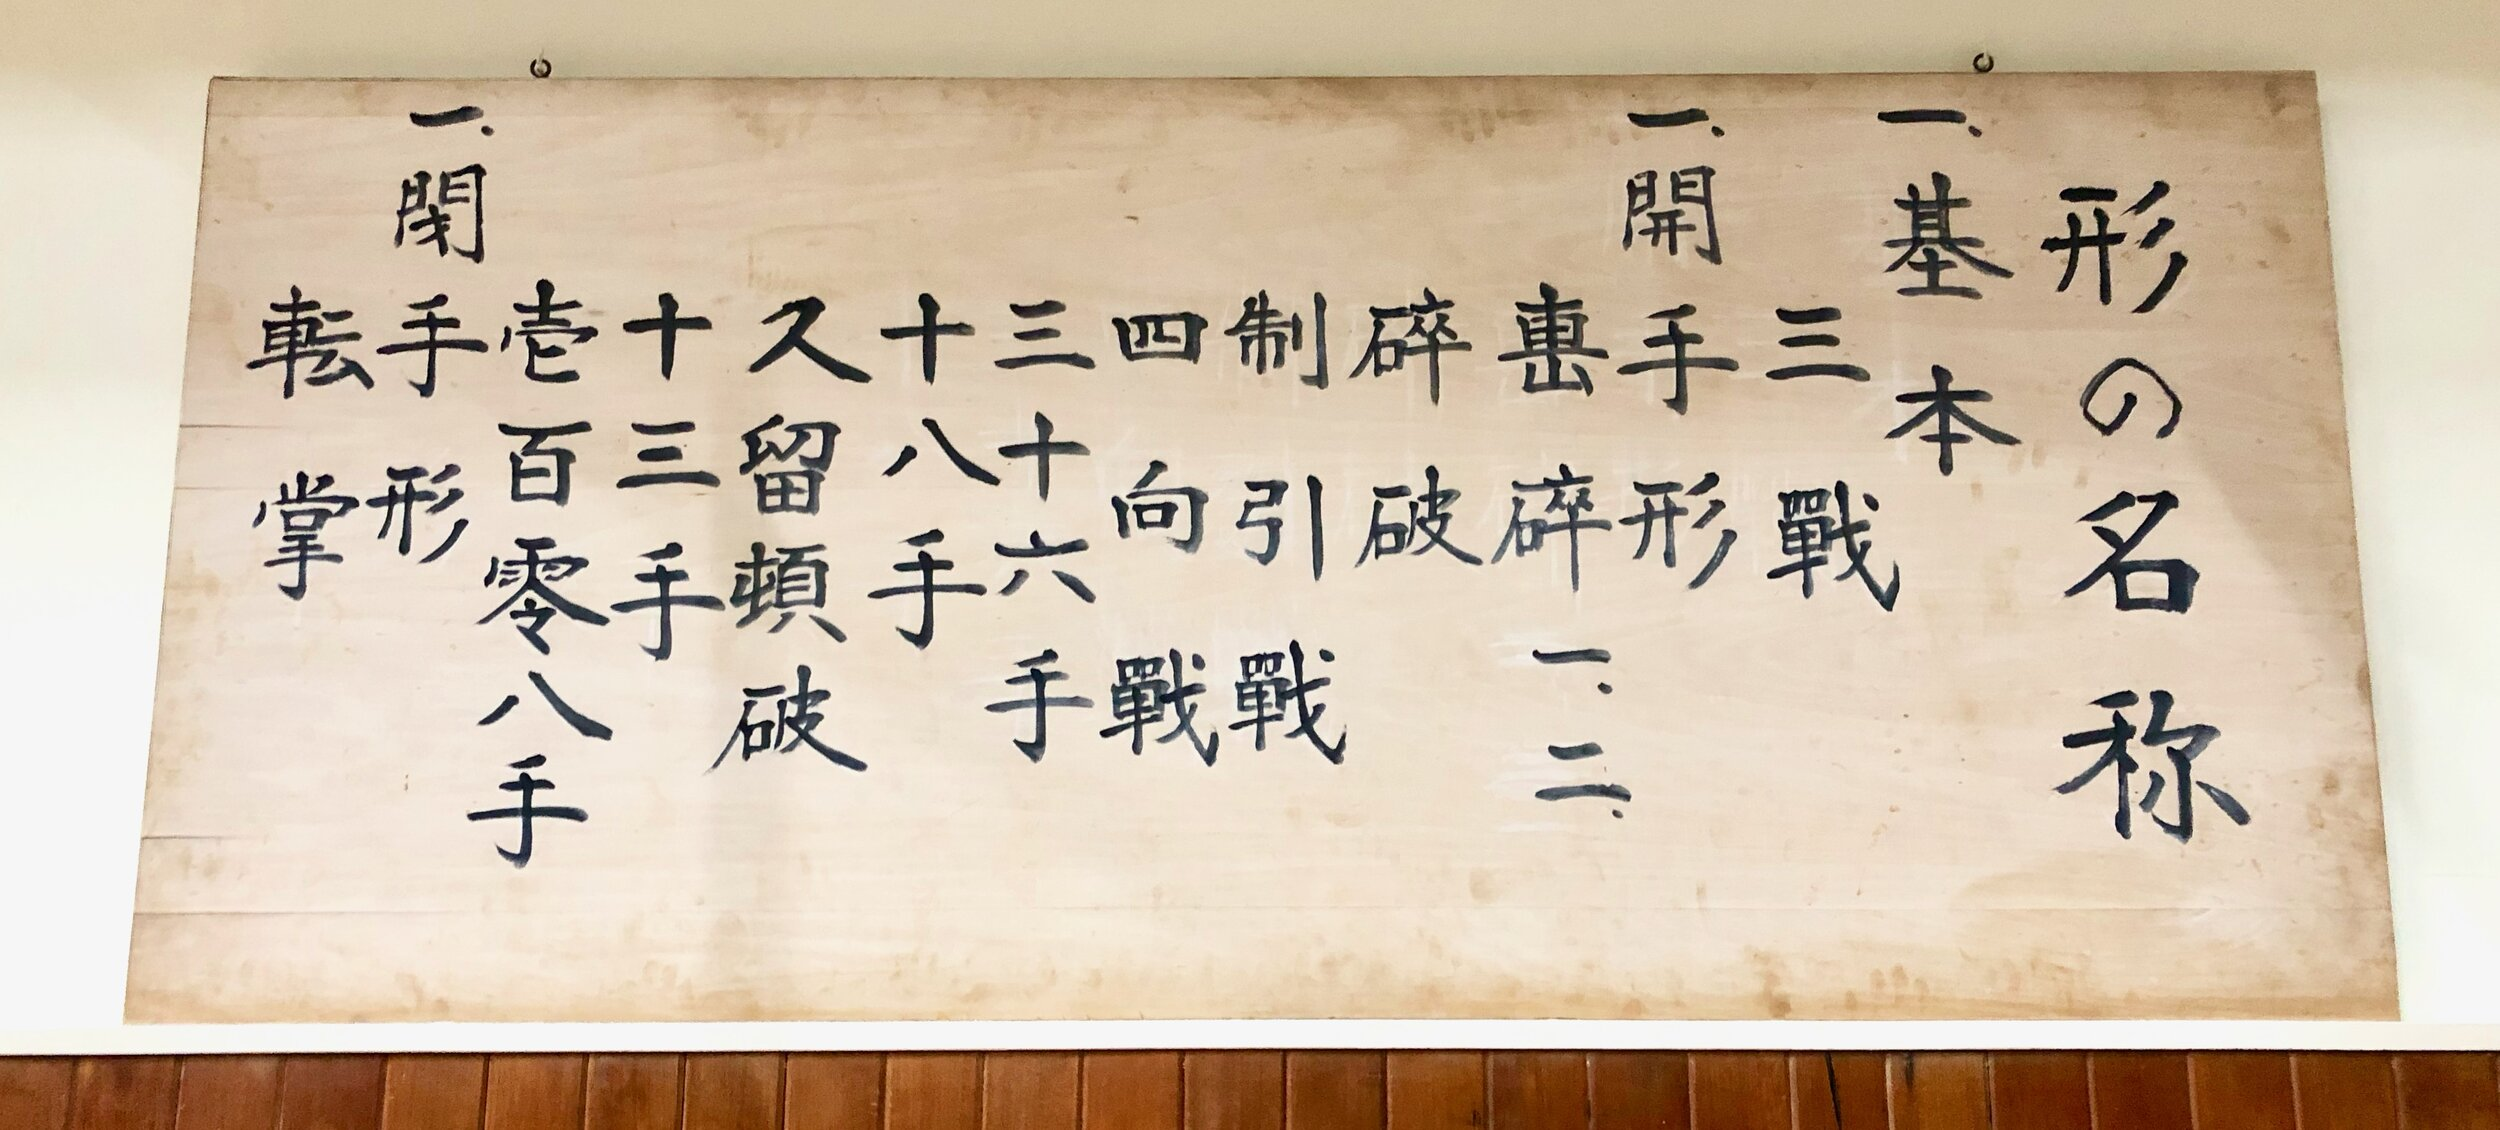 The Kata names hanging in the Jundokan Dojo